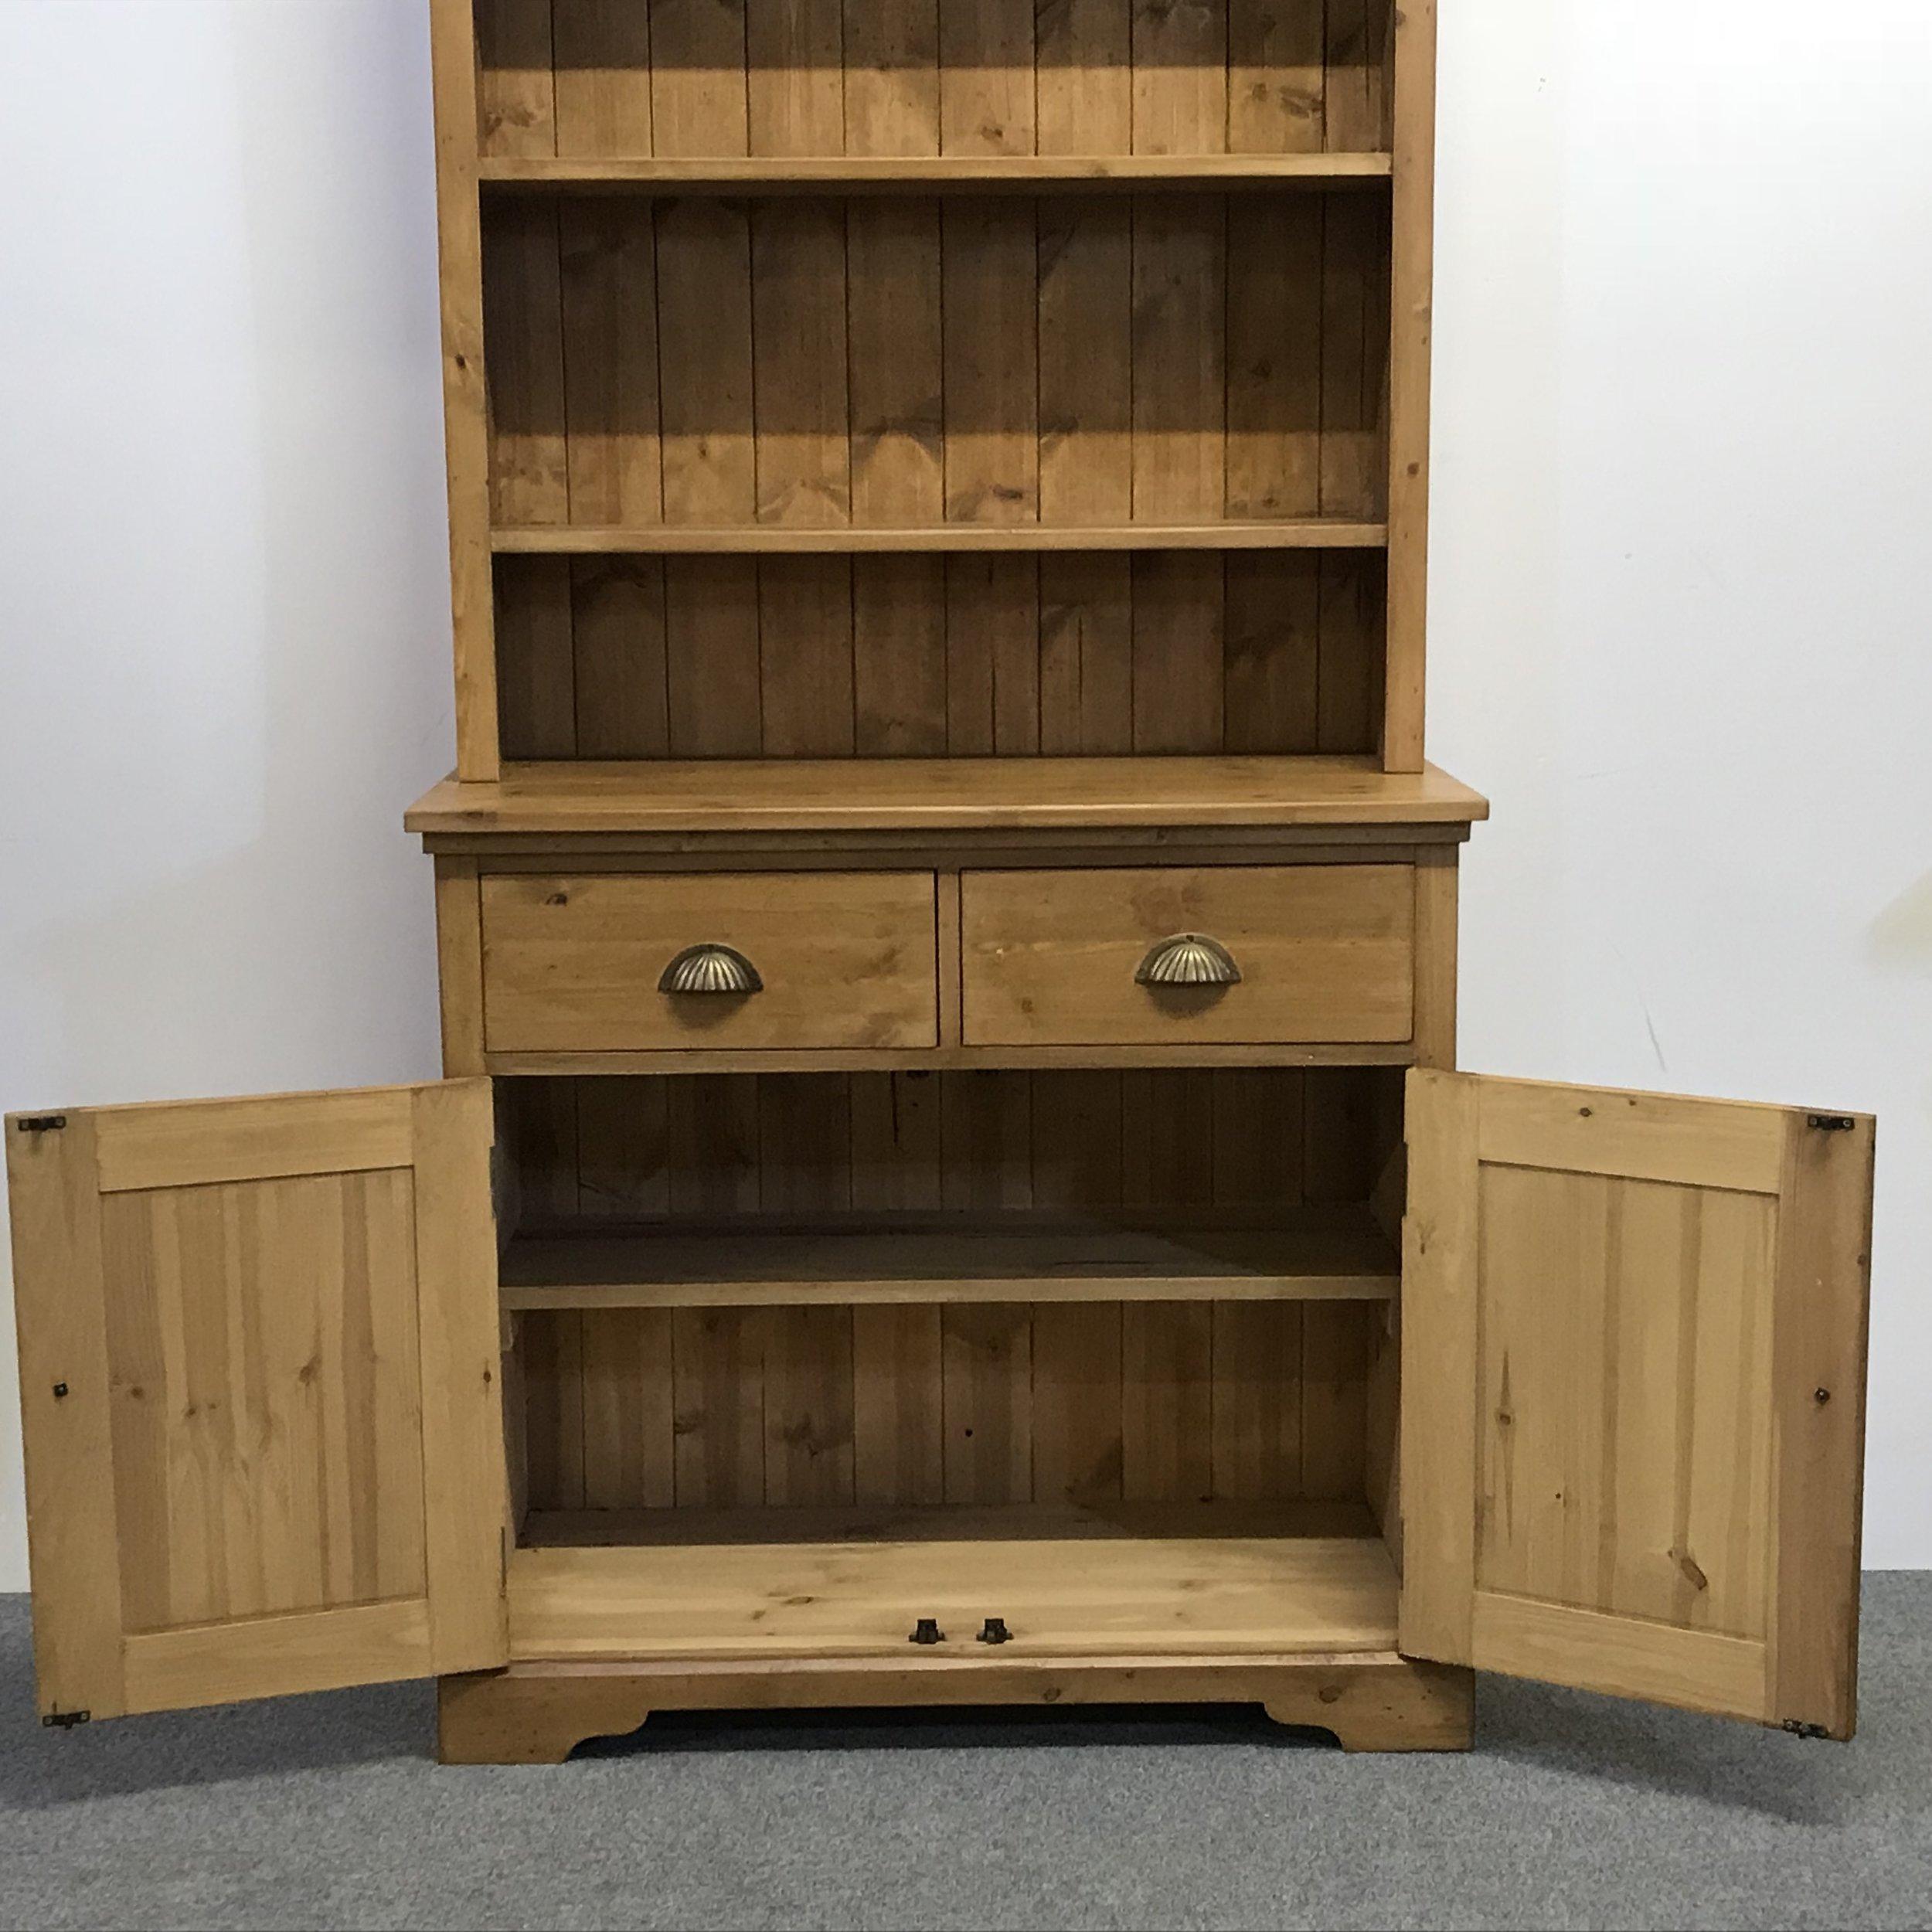 Shelf inside the base